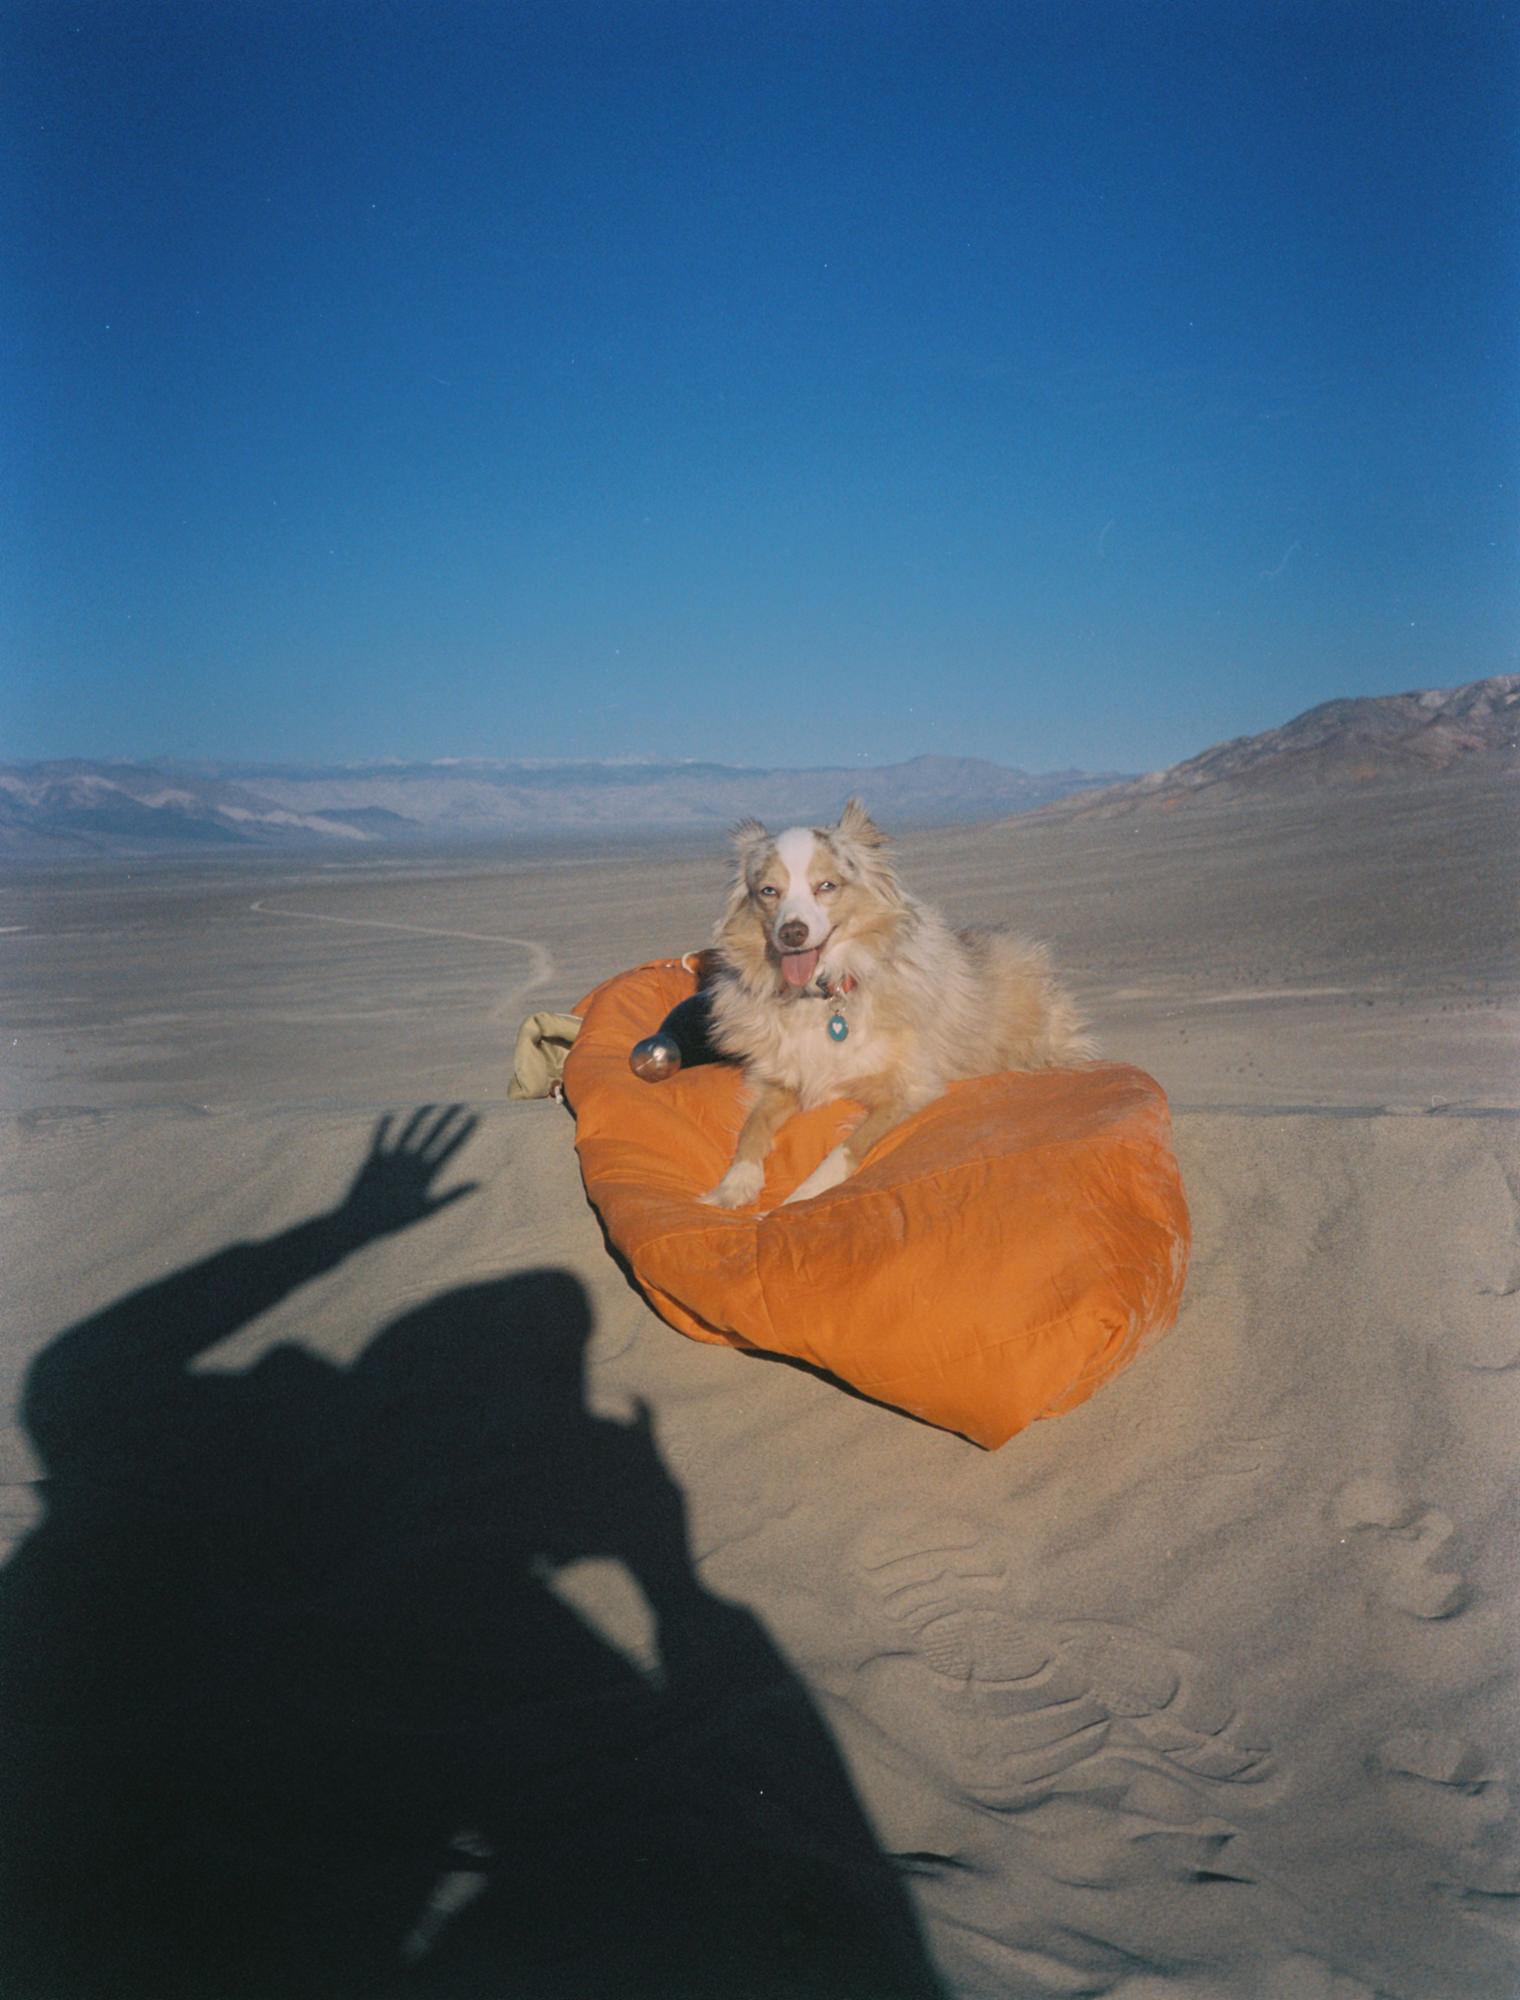 desert-camping-fujiGA645zi-23.jpg